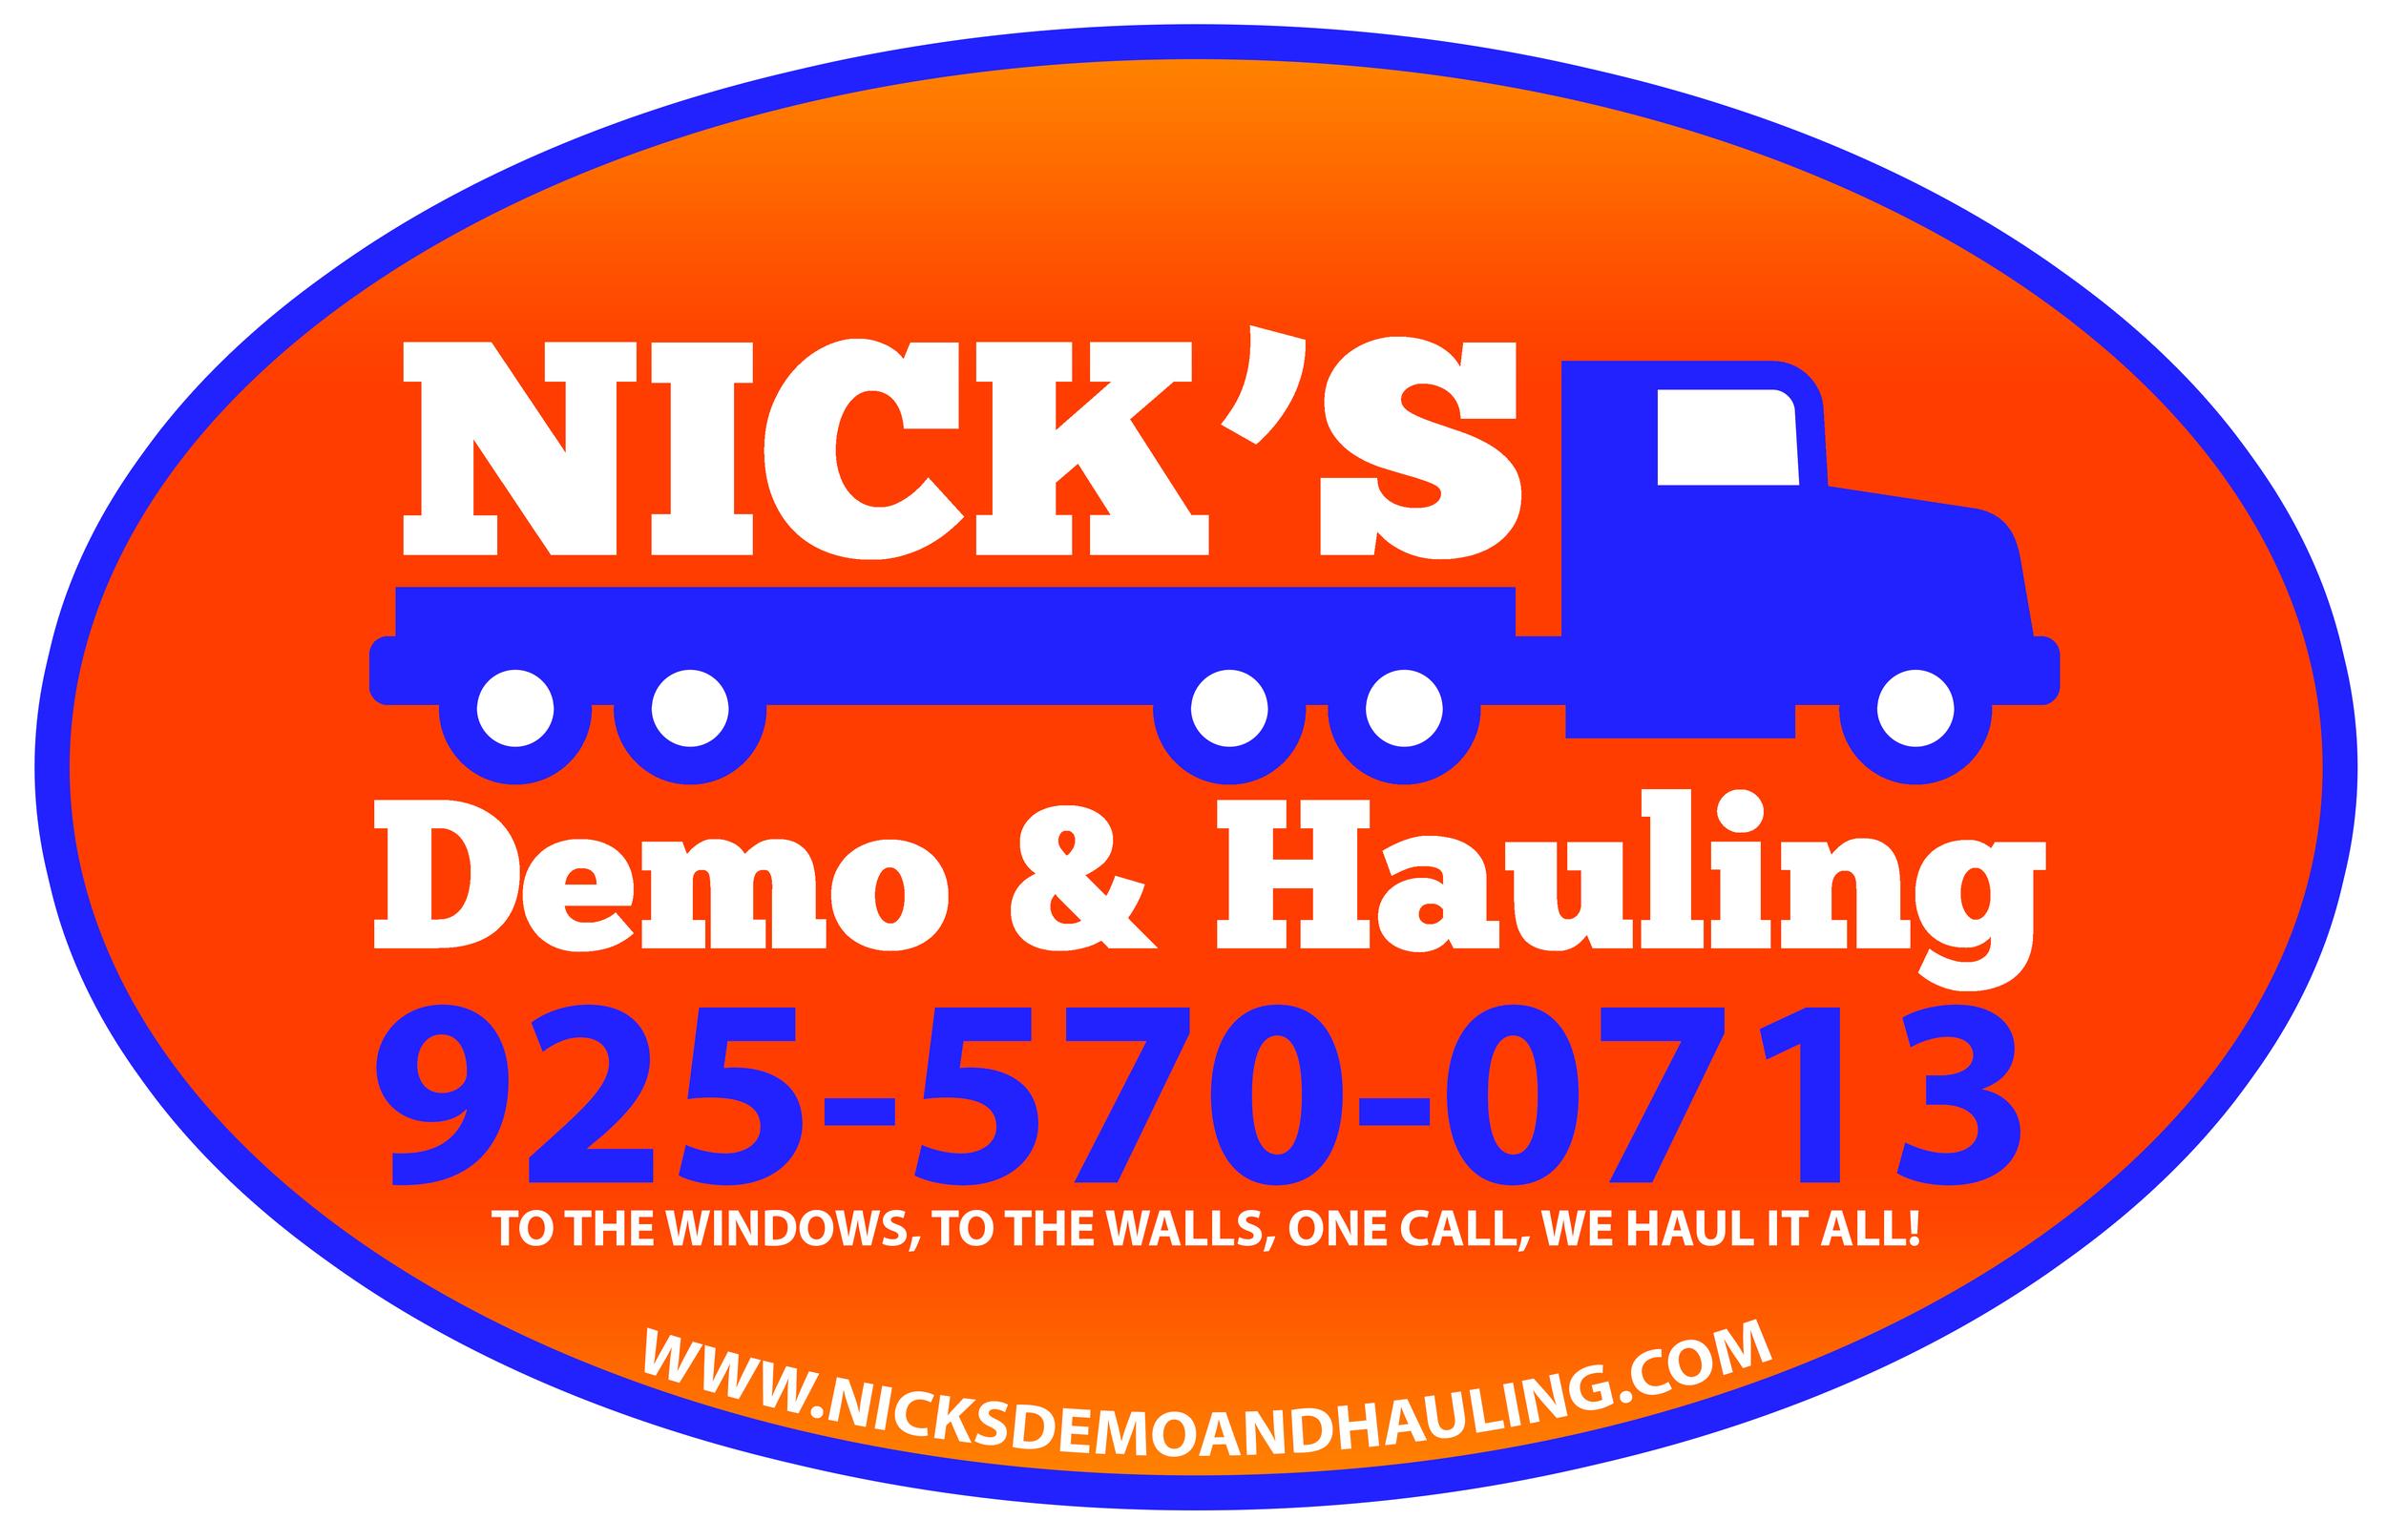 Nicks Demo & Hauling Sticker.jpg